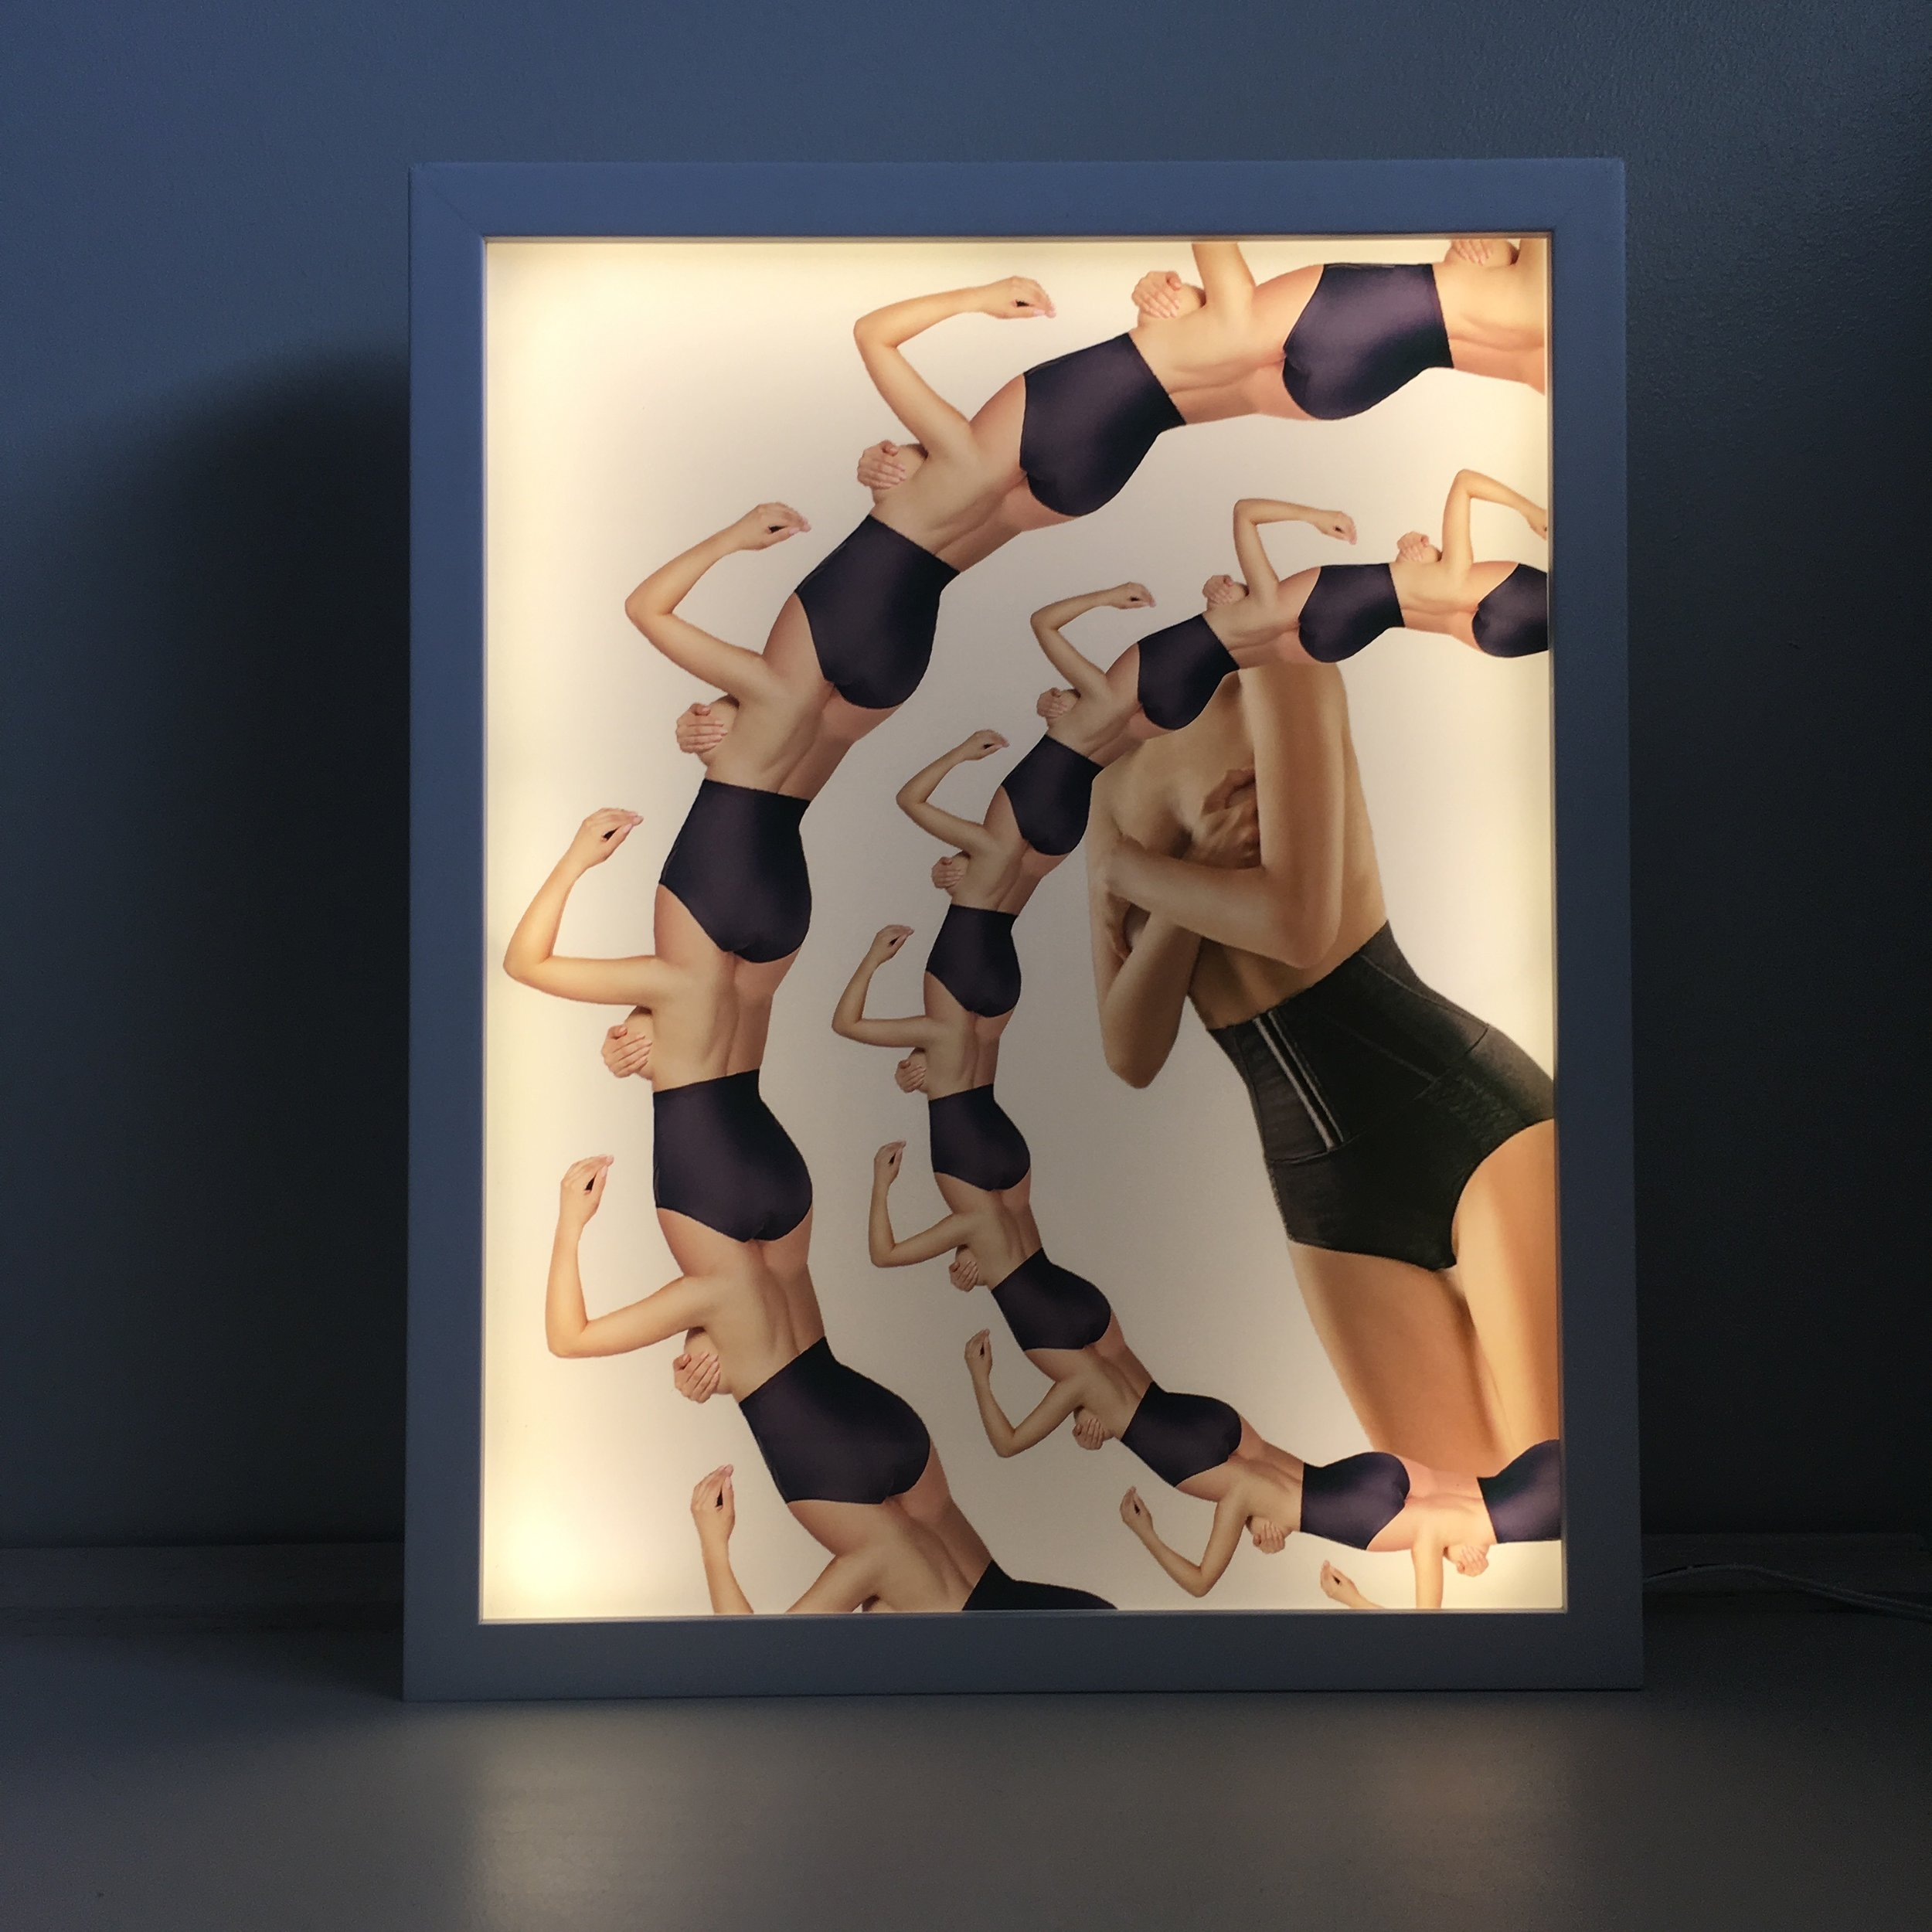 Shapewear (4) - digital collage light box, 12 x 5